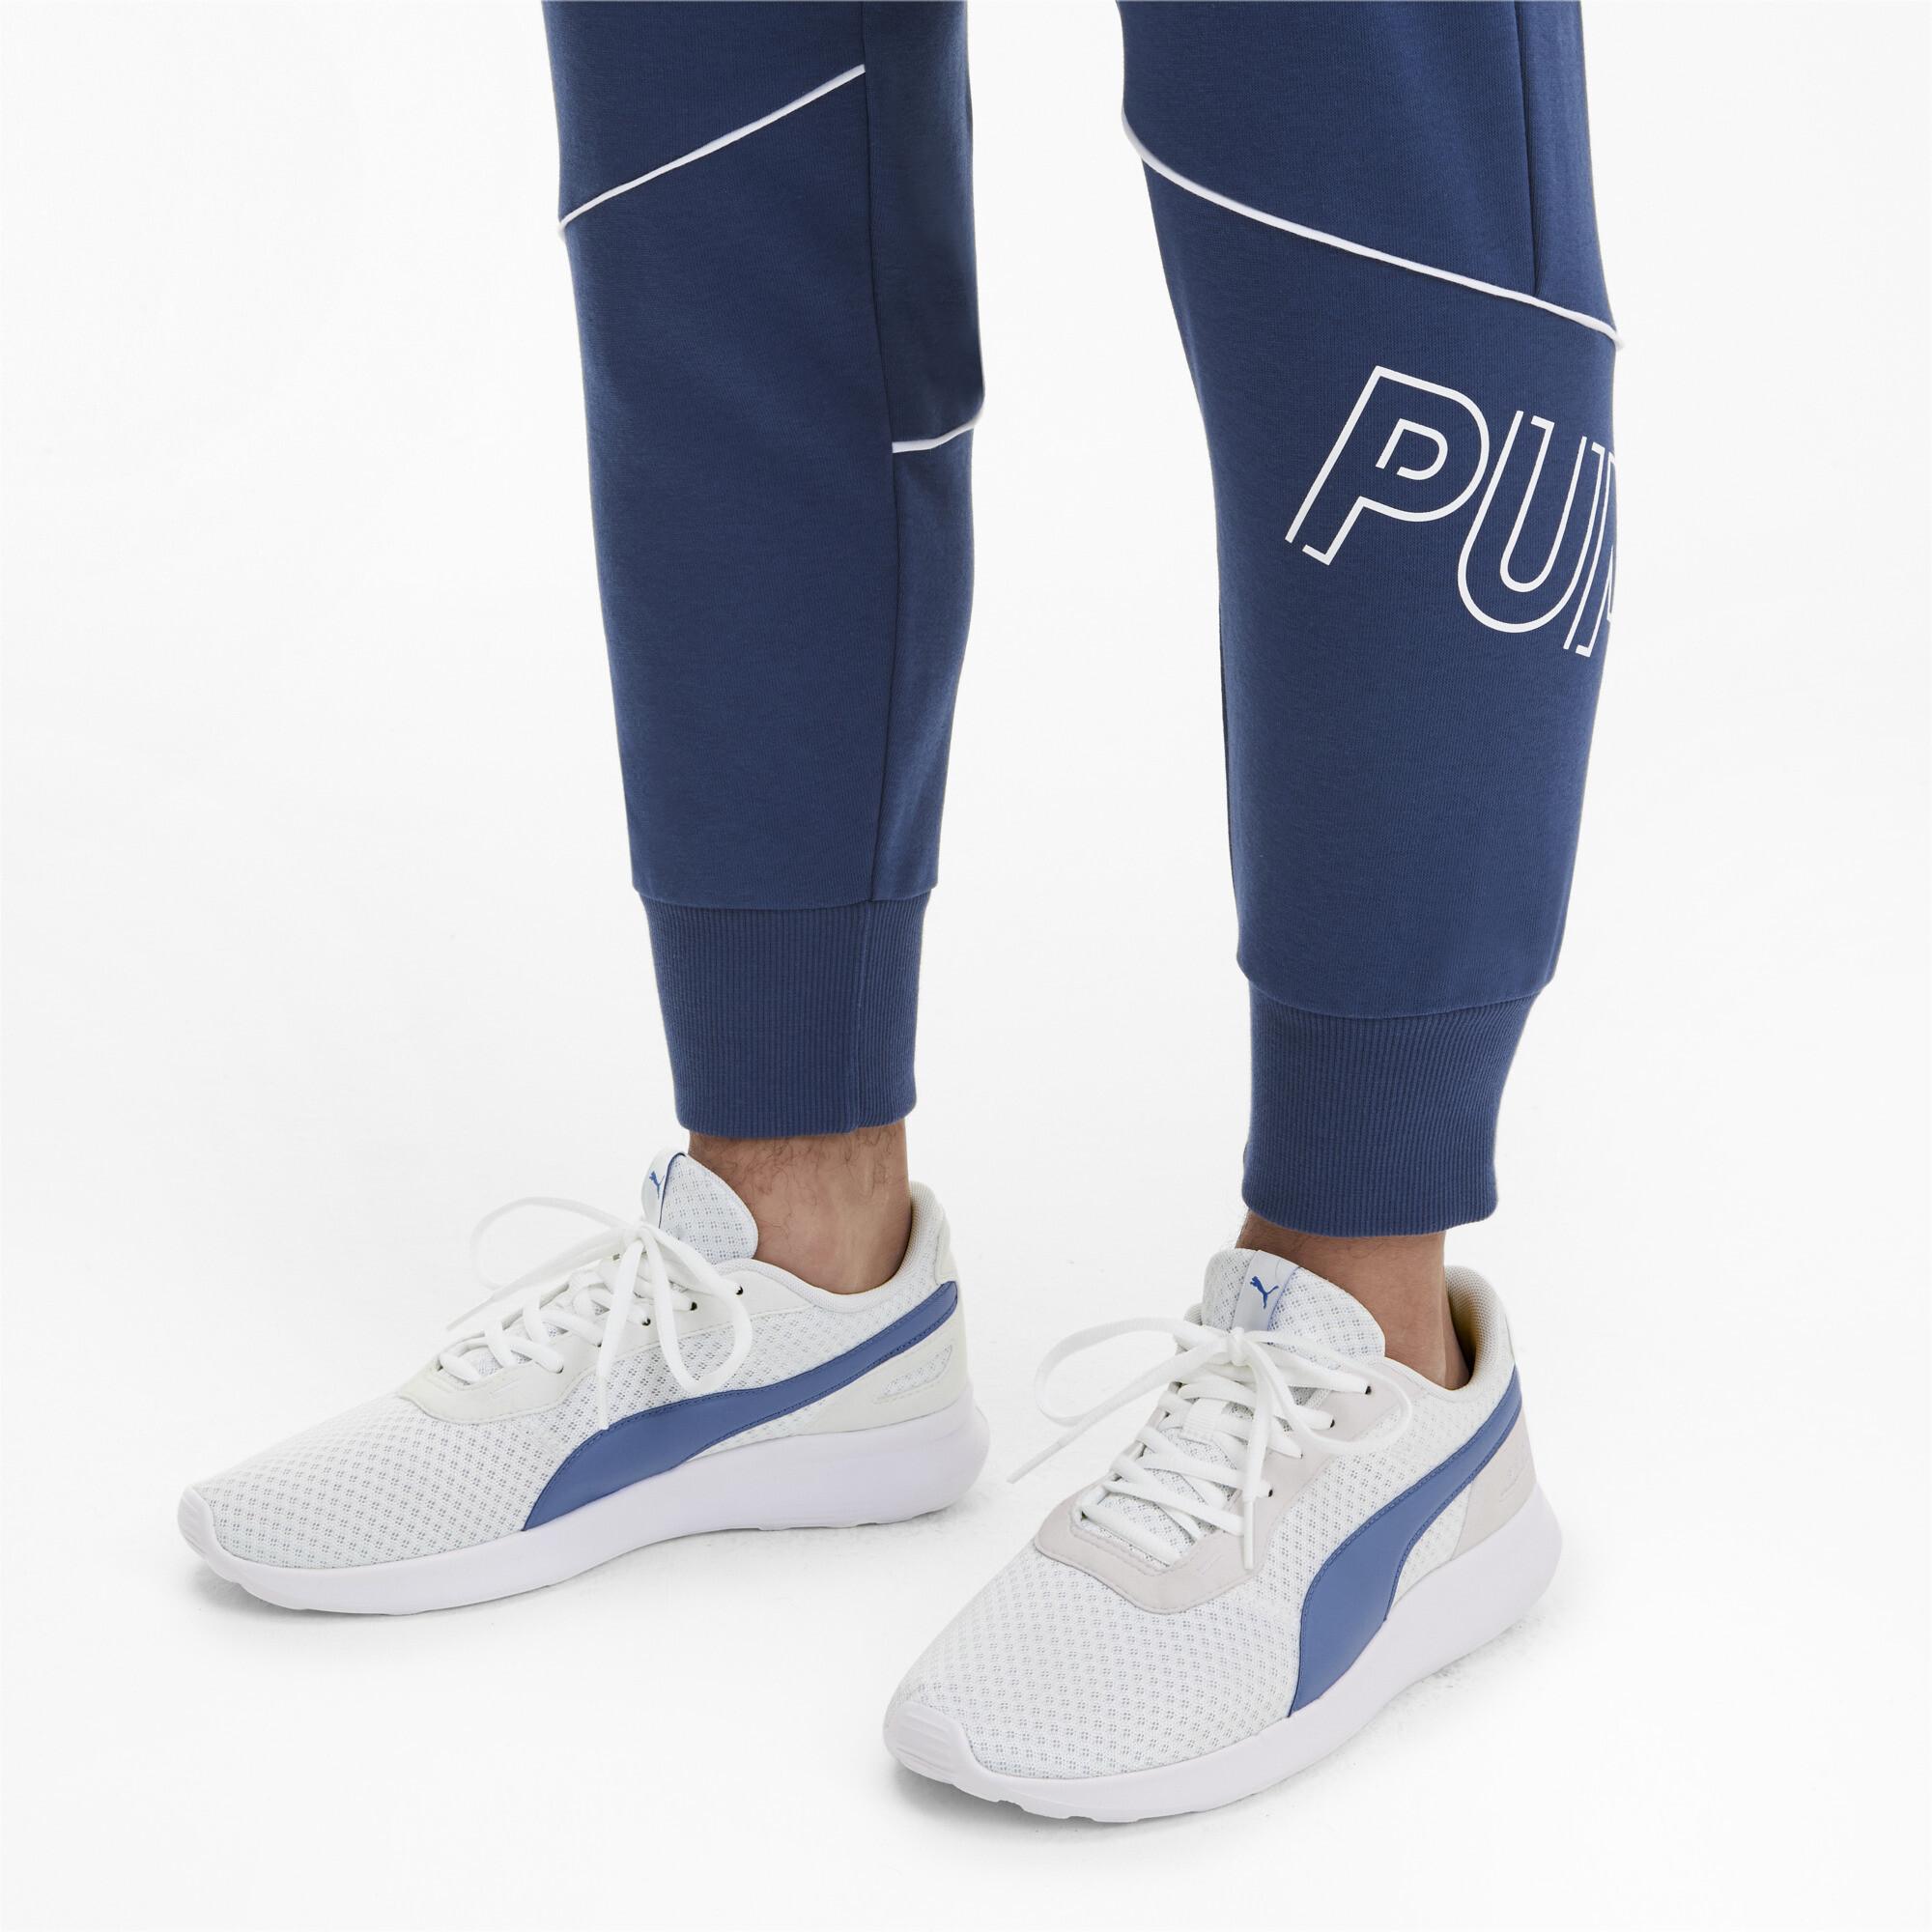 PUMA-Men-039-s-ST-Activate-Sneakers thumbnail 27